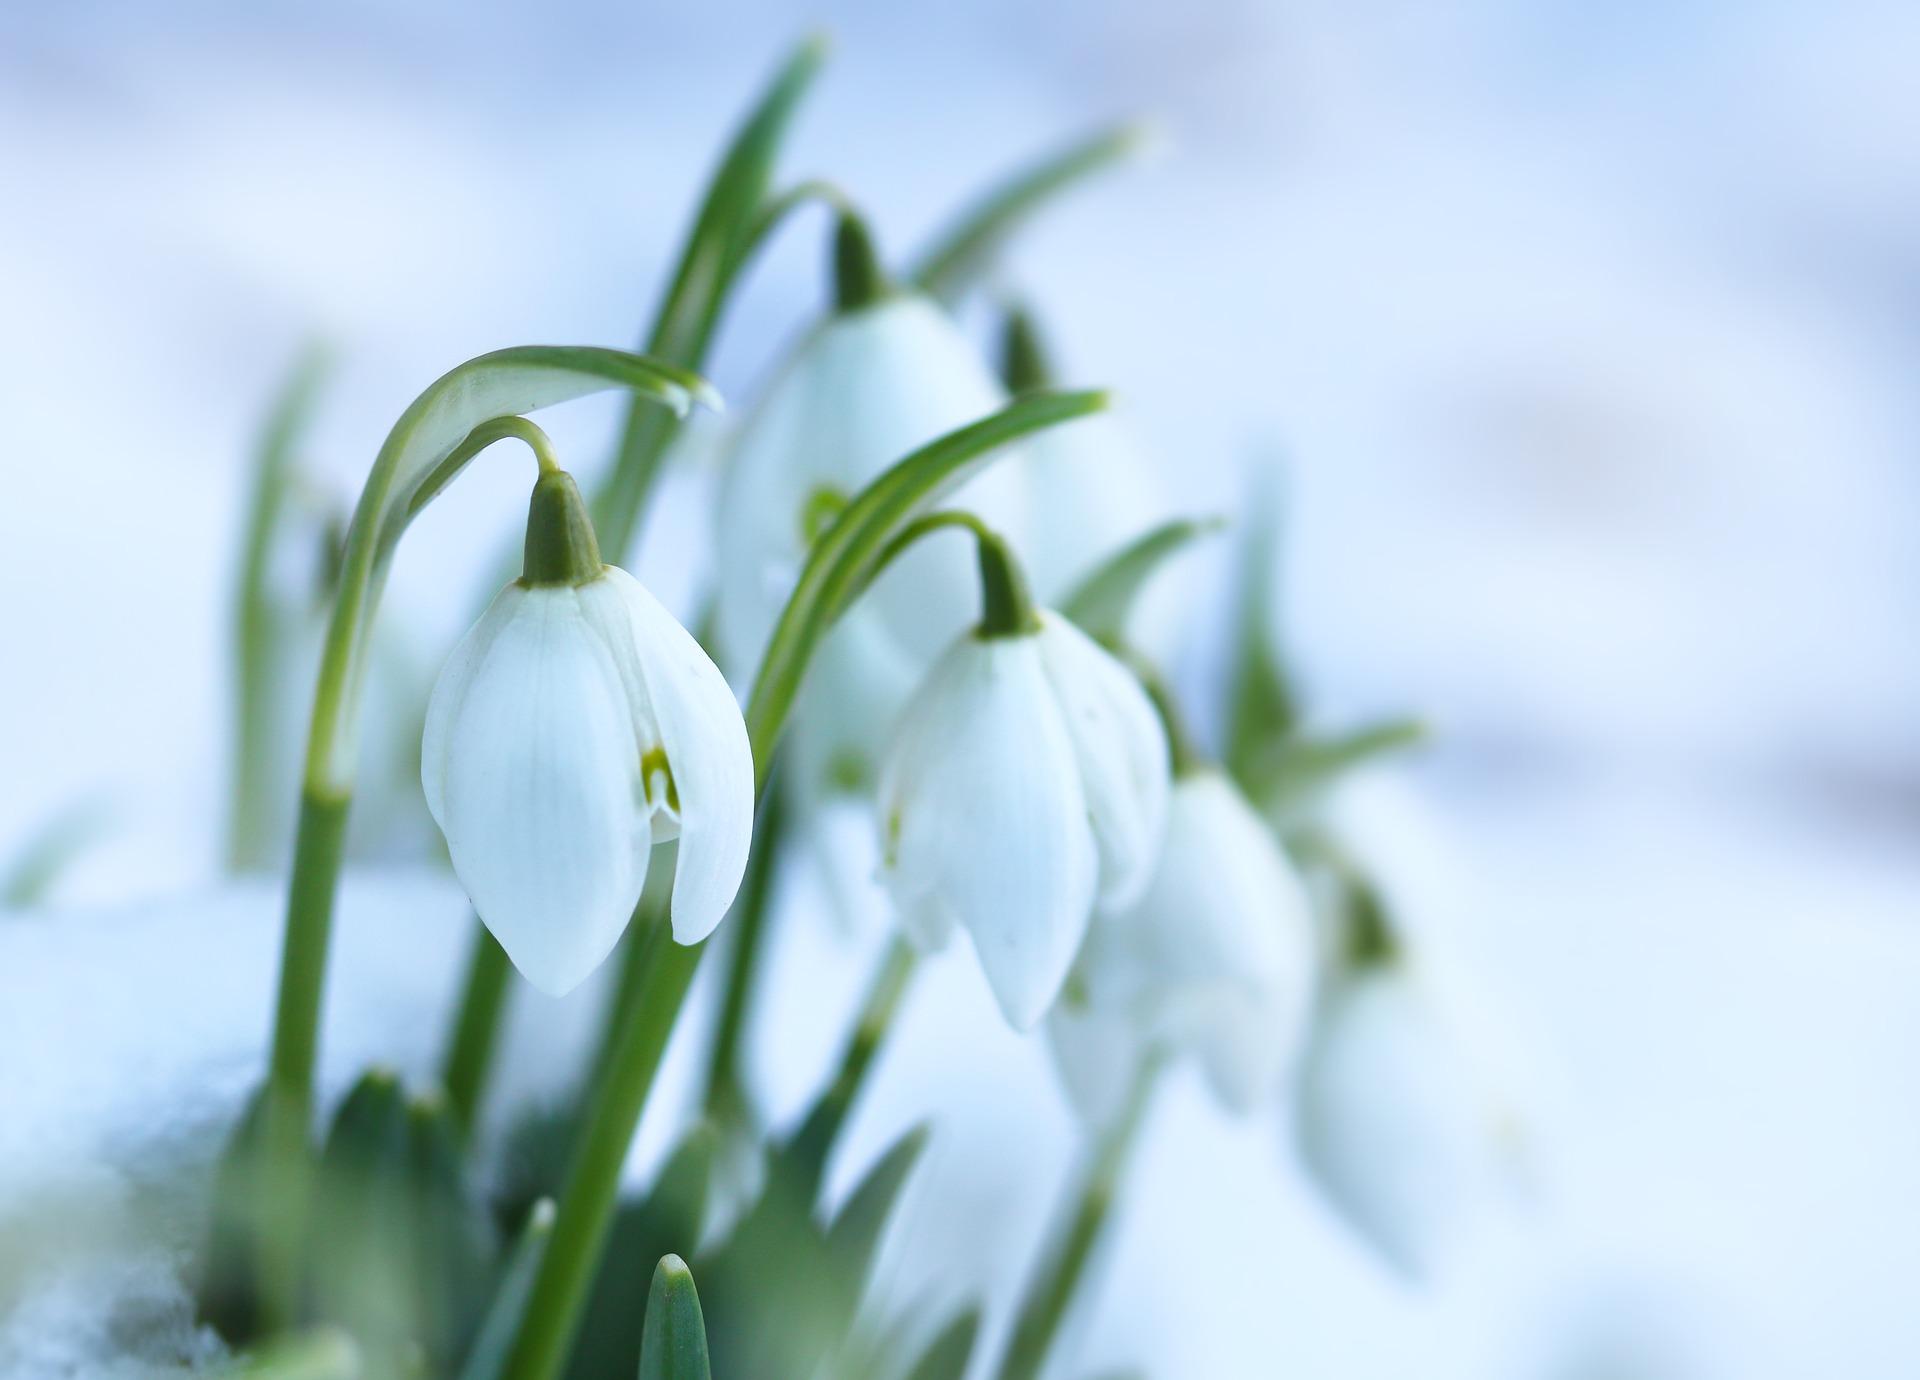 snowdrops-3236773_1920.jpg